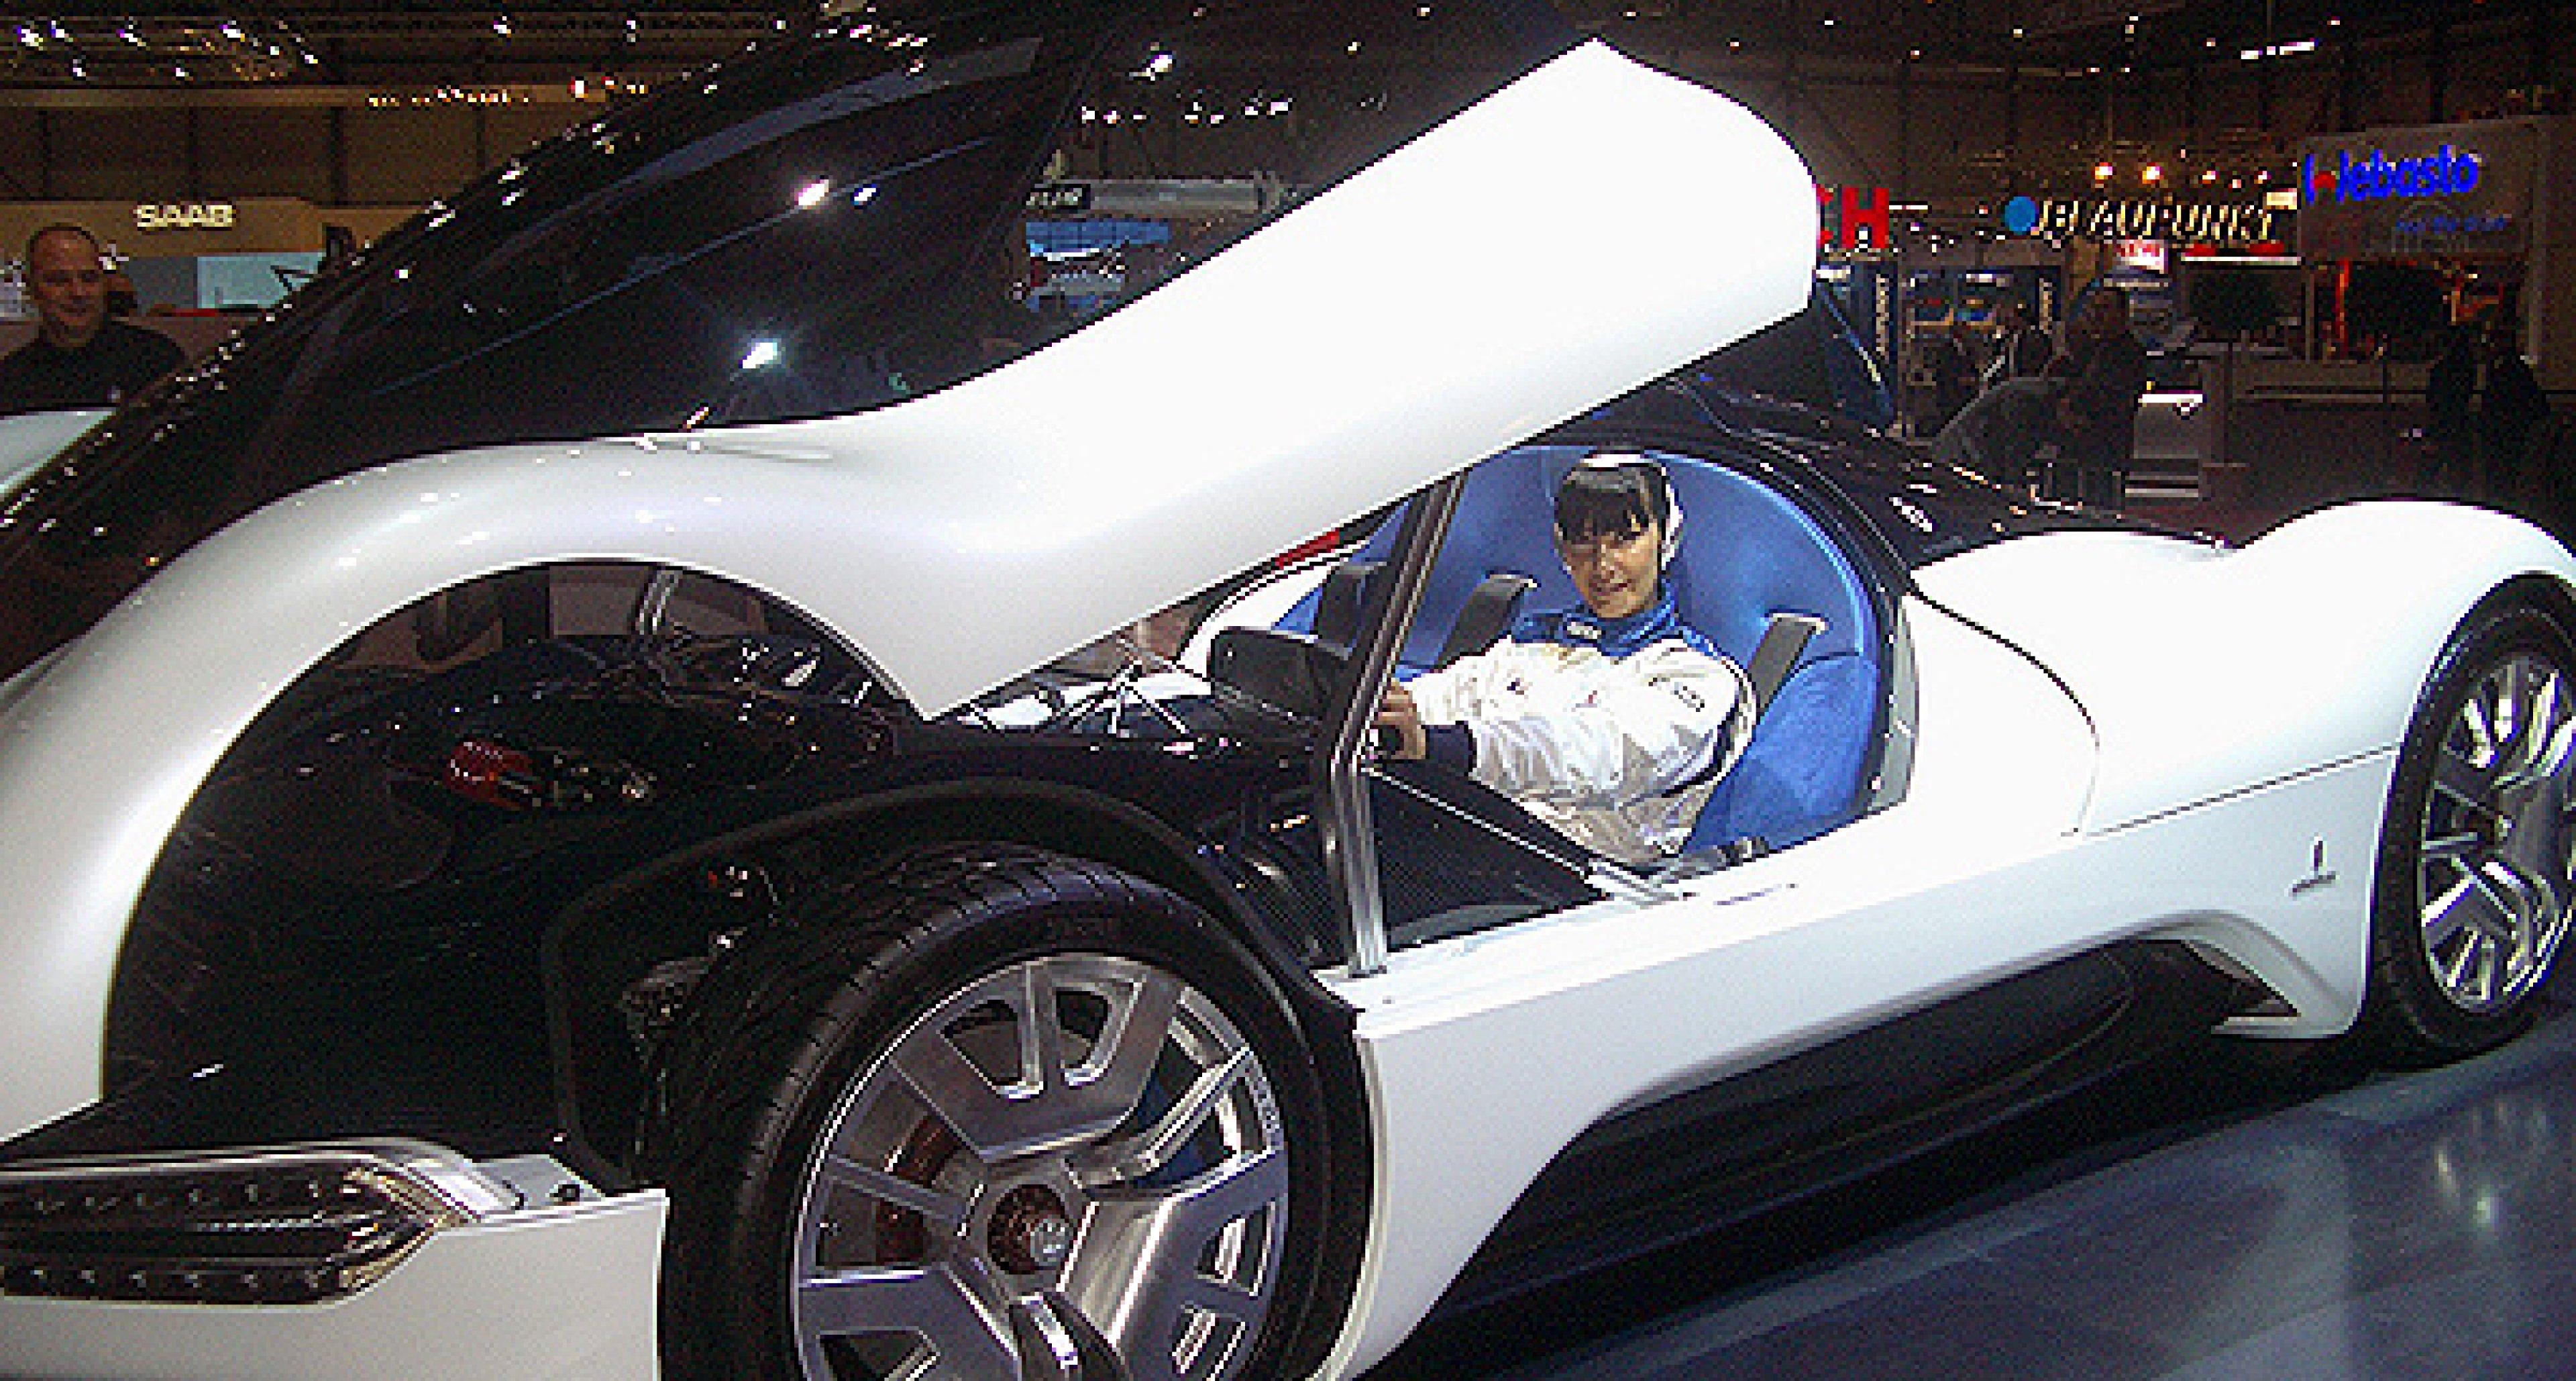 Genfer Impressionen – der Salon de l'Automobile 2005